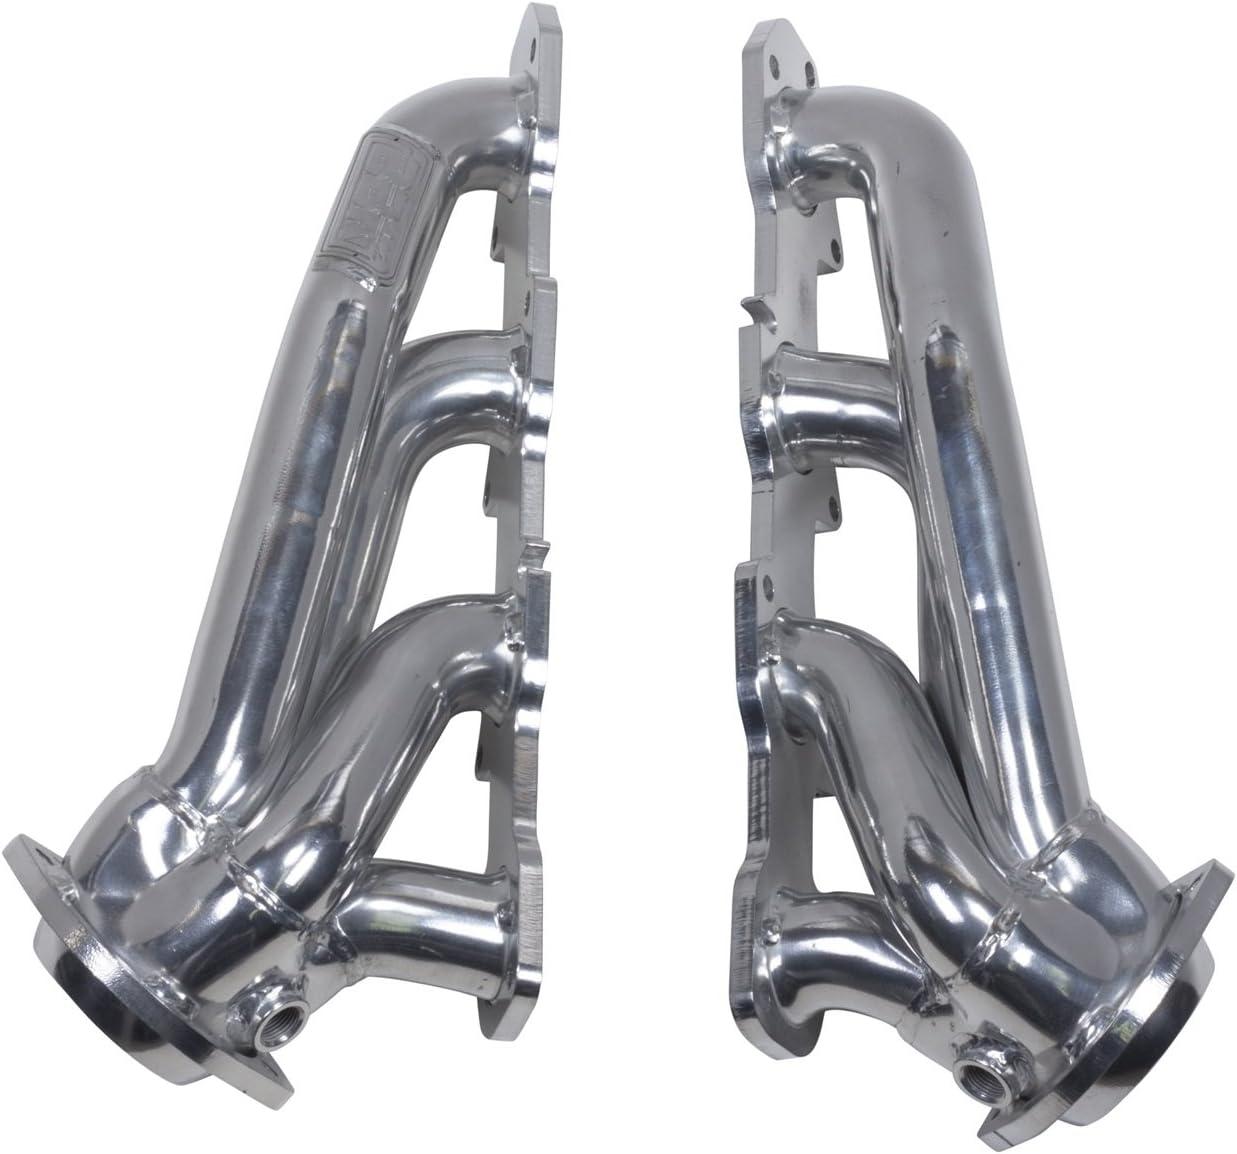 1 Pack BBK 40280 Silver Exhaust Headers 11-17 Dodge Hemi 5.7L Shorty Tuned Length - 1-3//4in Ceramic